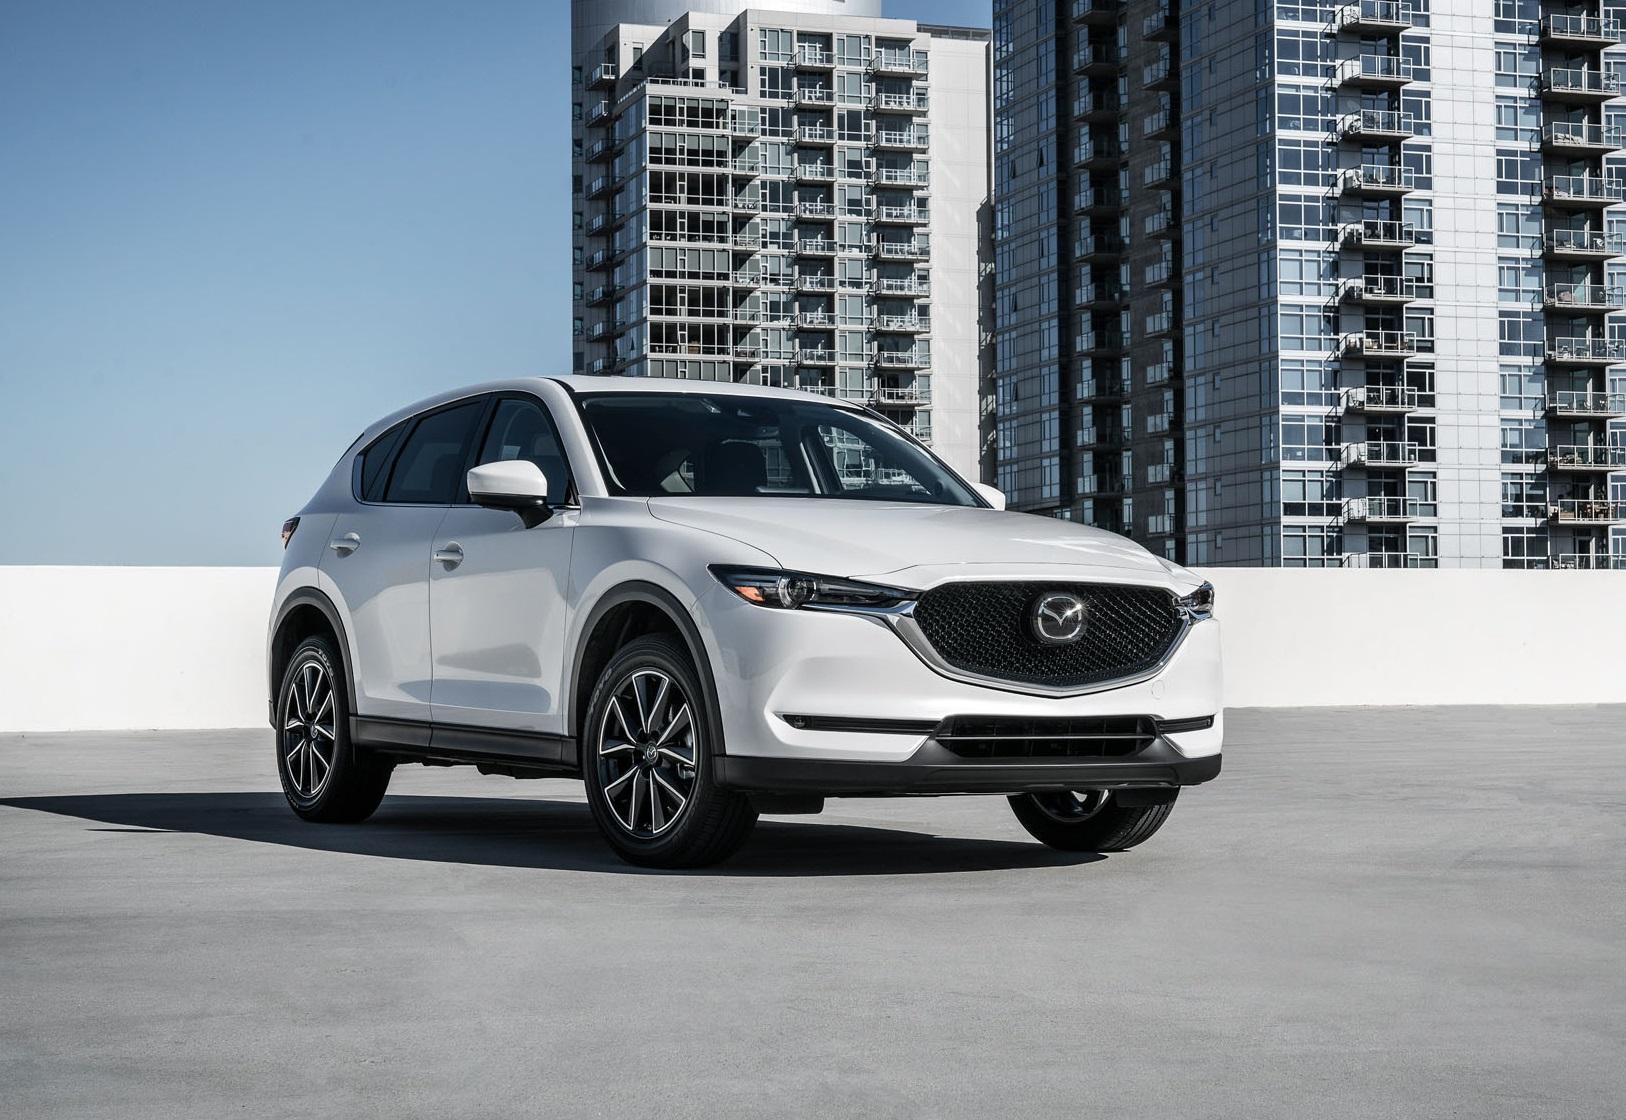 Kelebihan Mazda Skyactiv G Perbandingan Harga